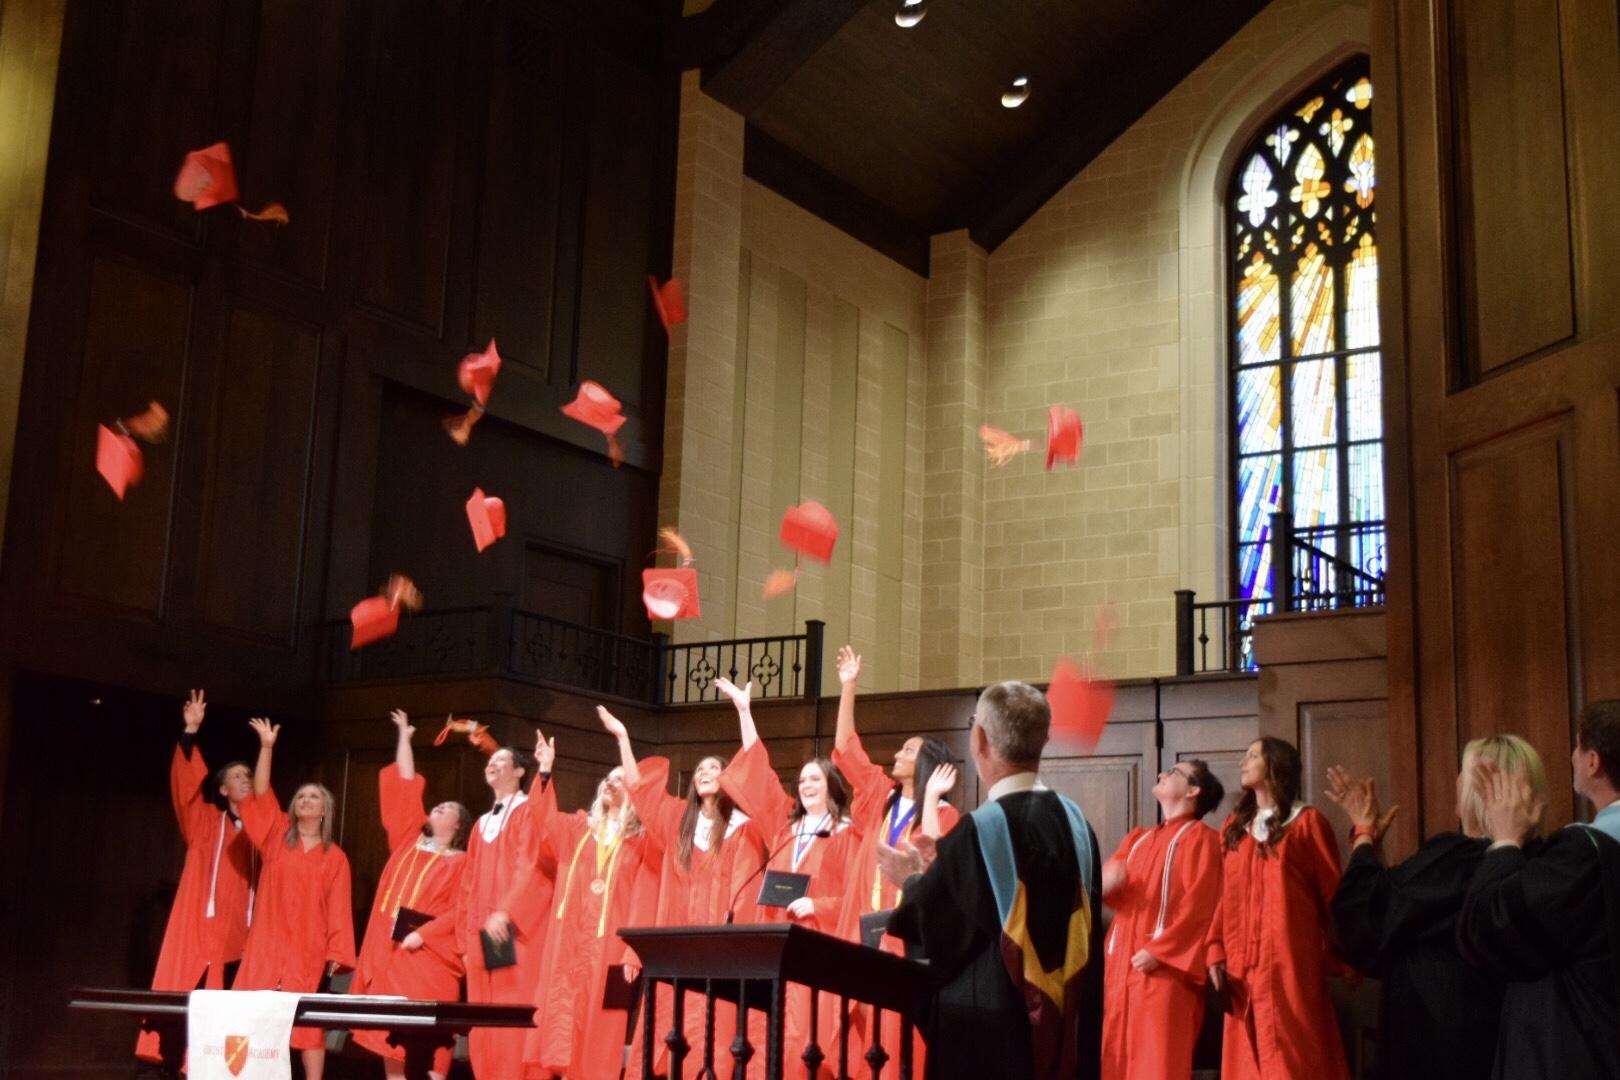 Christ-Academy-senior-class-2019-graduation.jpg